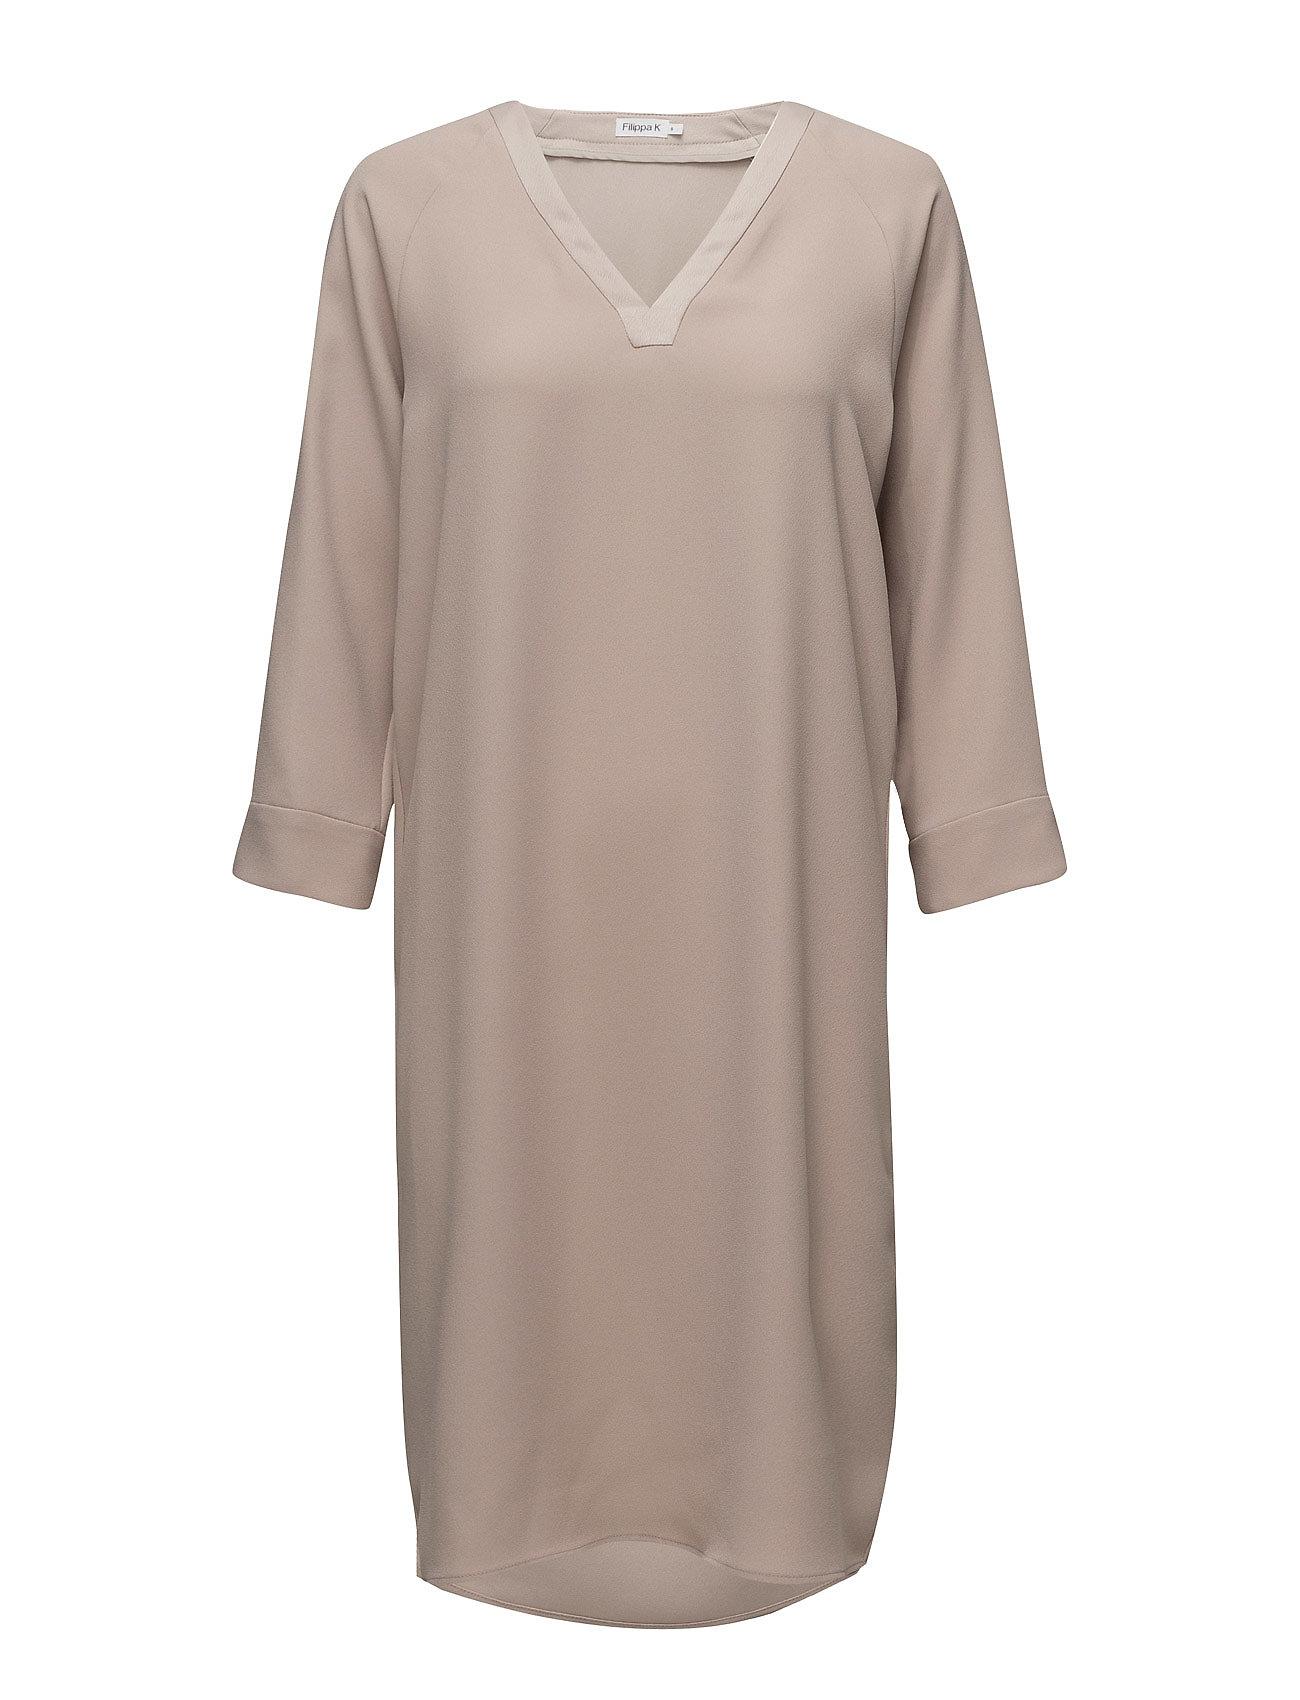 Filippa K V-Neck Tunic Dress - FAWN